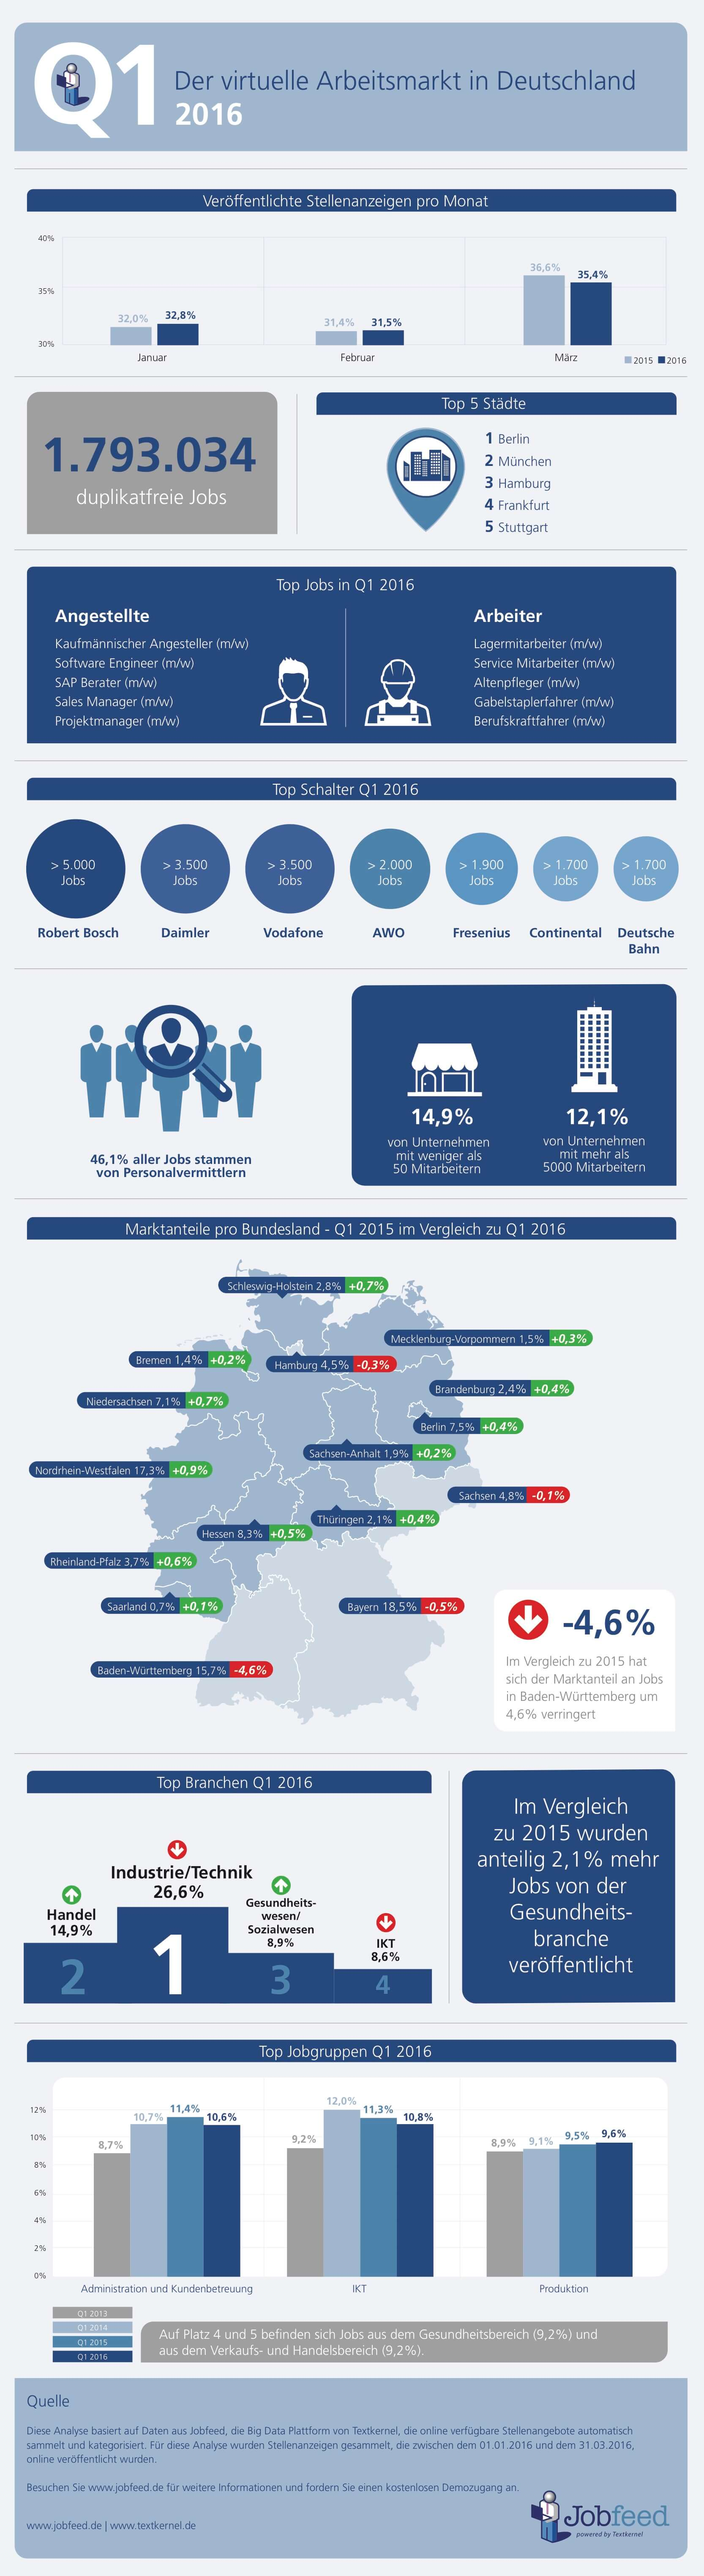 TEXT-044-infographic-Q1-D-V4